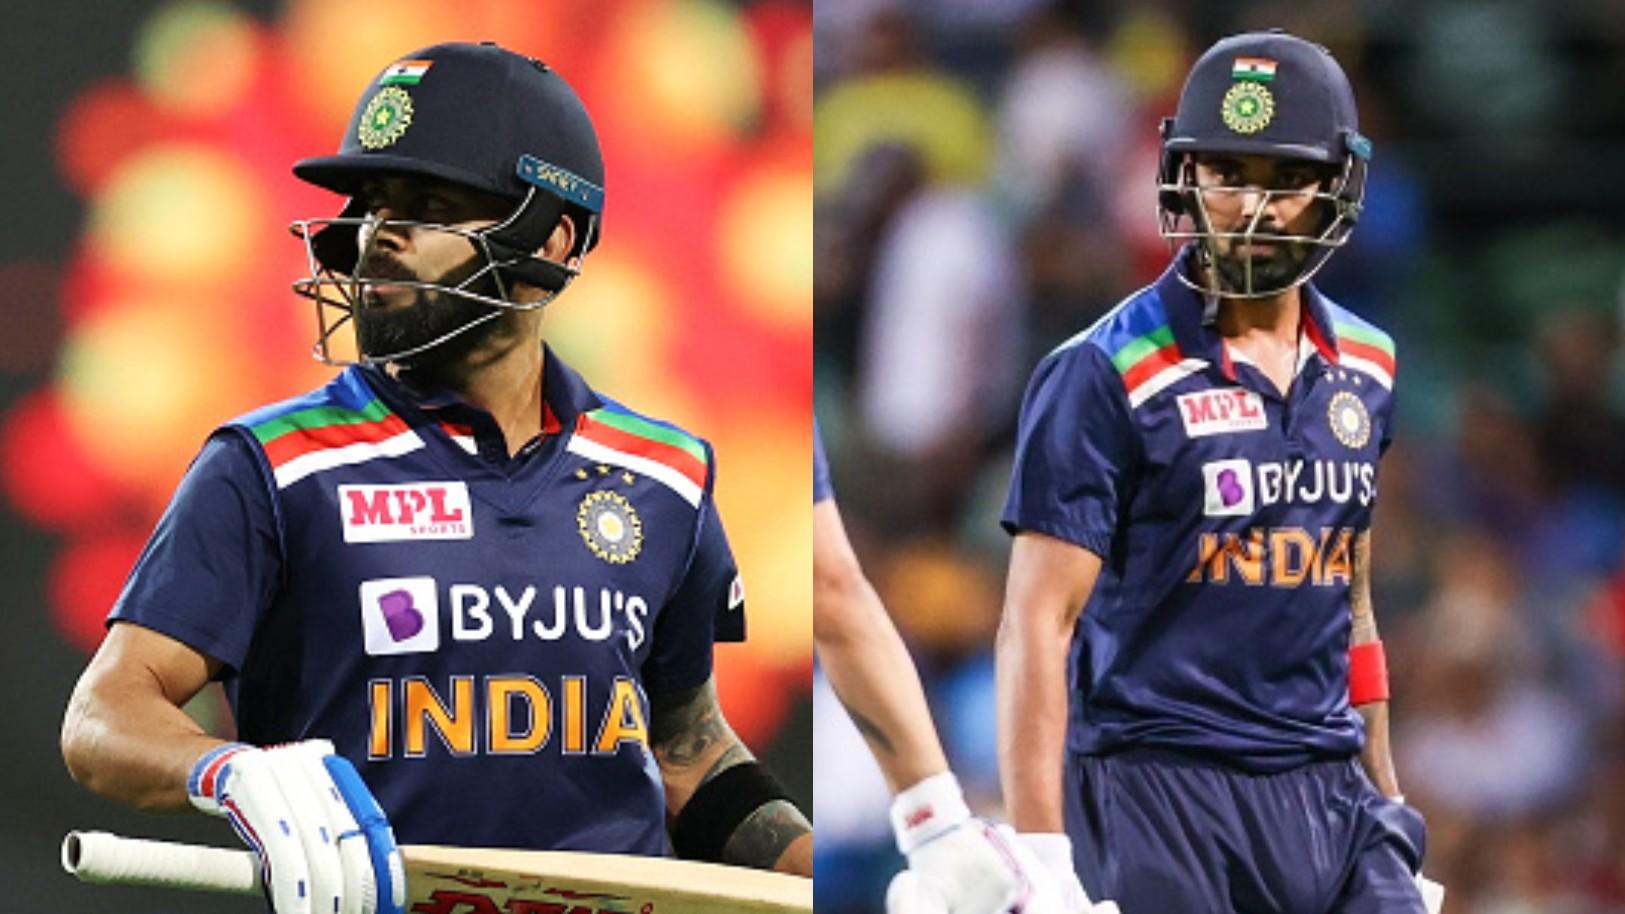 Virat Kohli moves to 7th spot in ICC T20I batting rankings; KL Rahul remains at no. 3 spot